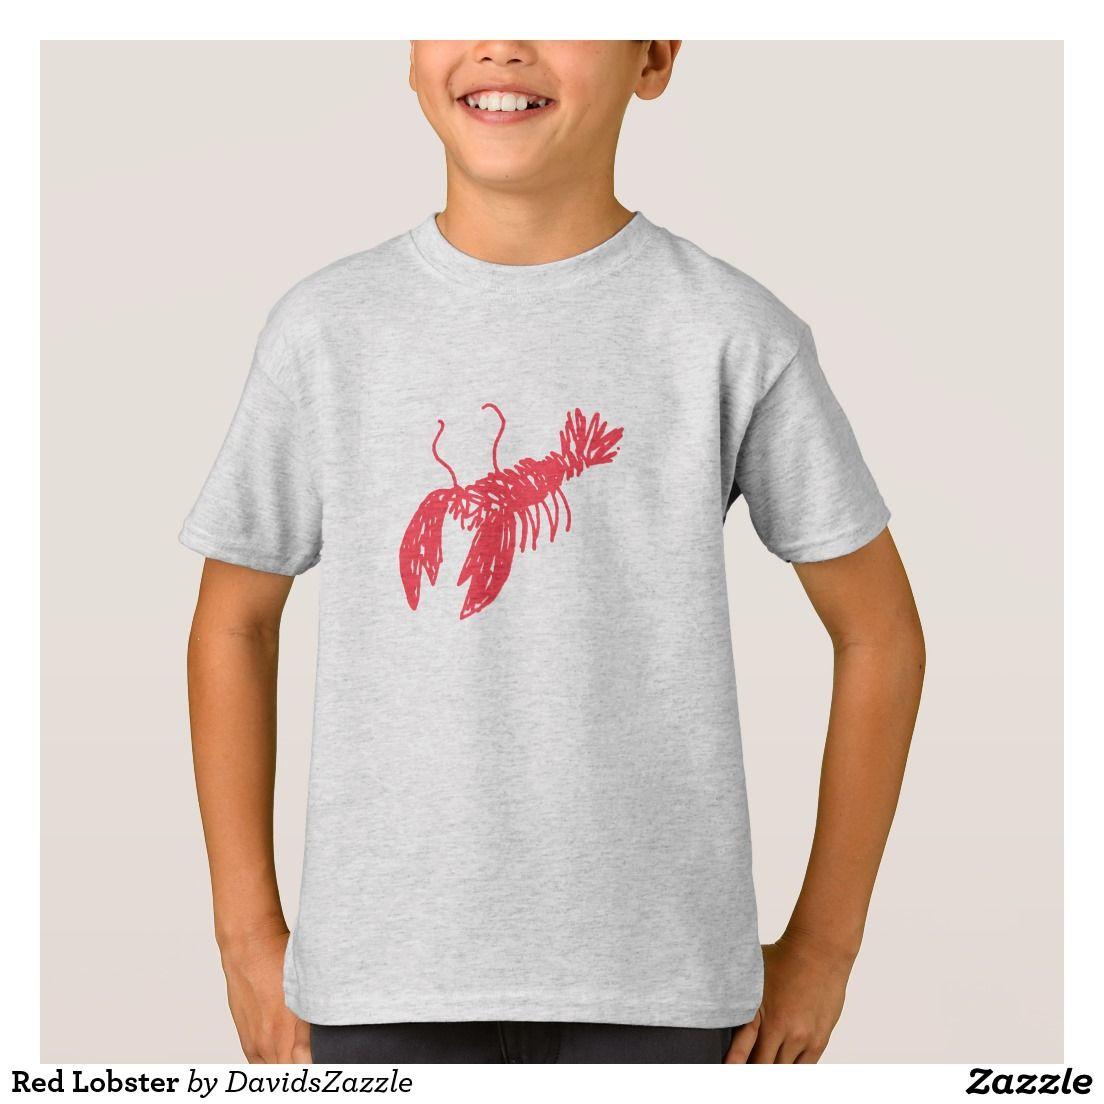 Red Lobster TShirt Cartoon t shirts